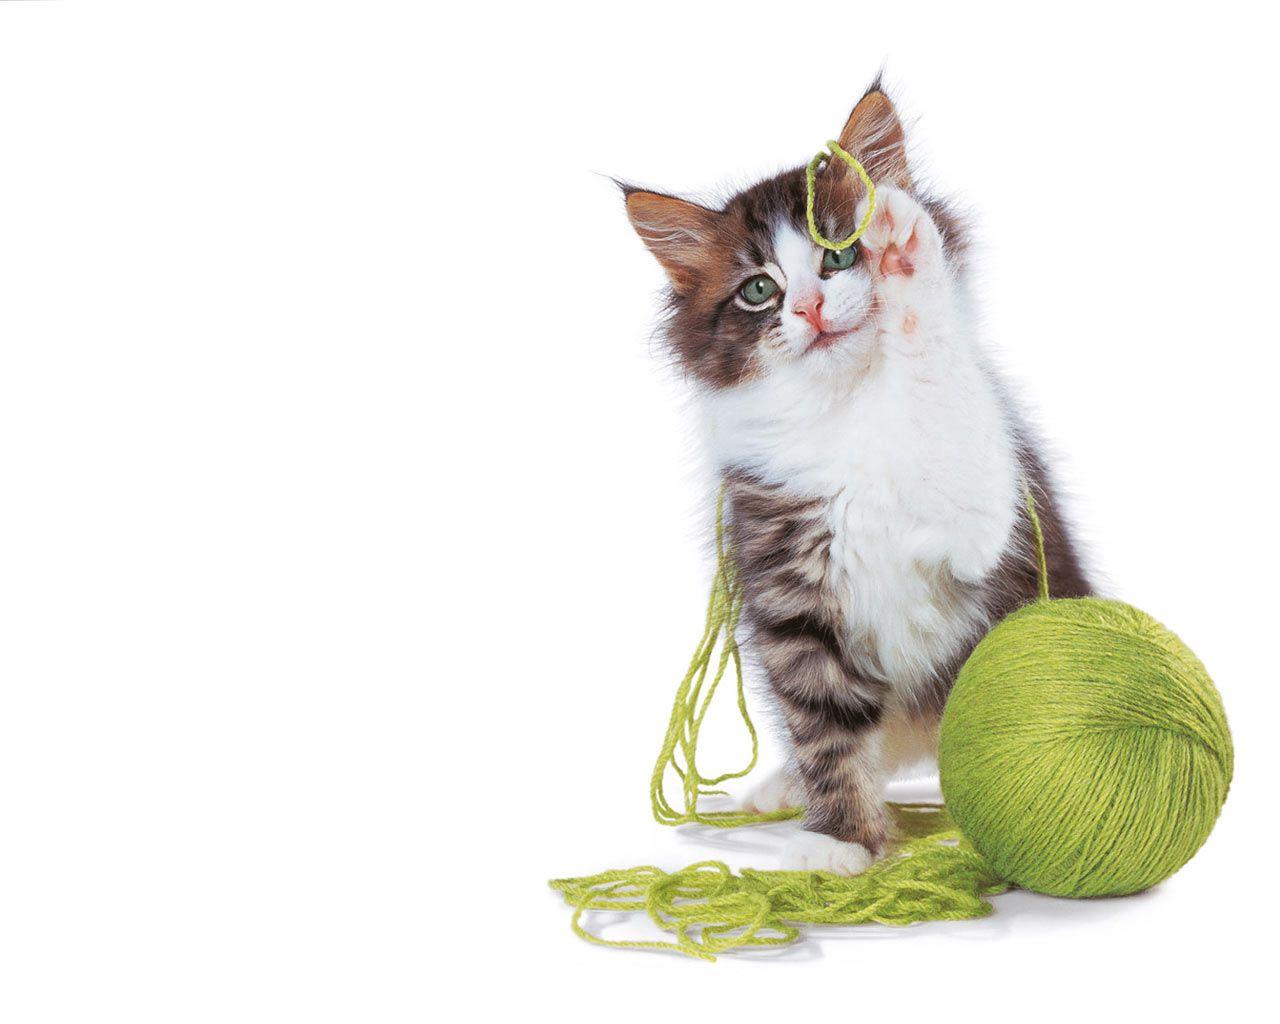 http://2.bp.blogspot.com/__CDOzUxuUaU/S9voehwvh_I/AAAAAAAAAKQ/1GFv5hHWhTw/s1600/cats%20wallpapers7.jpg